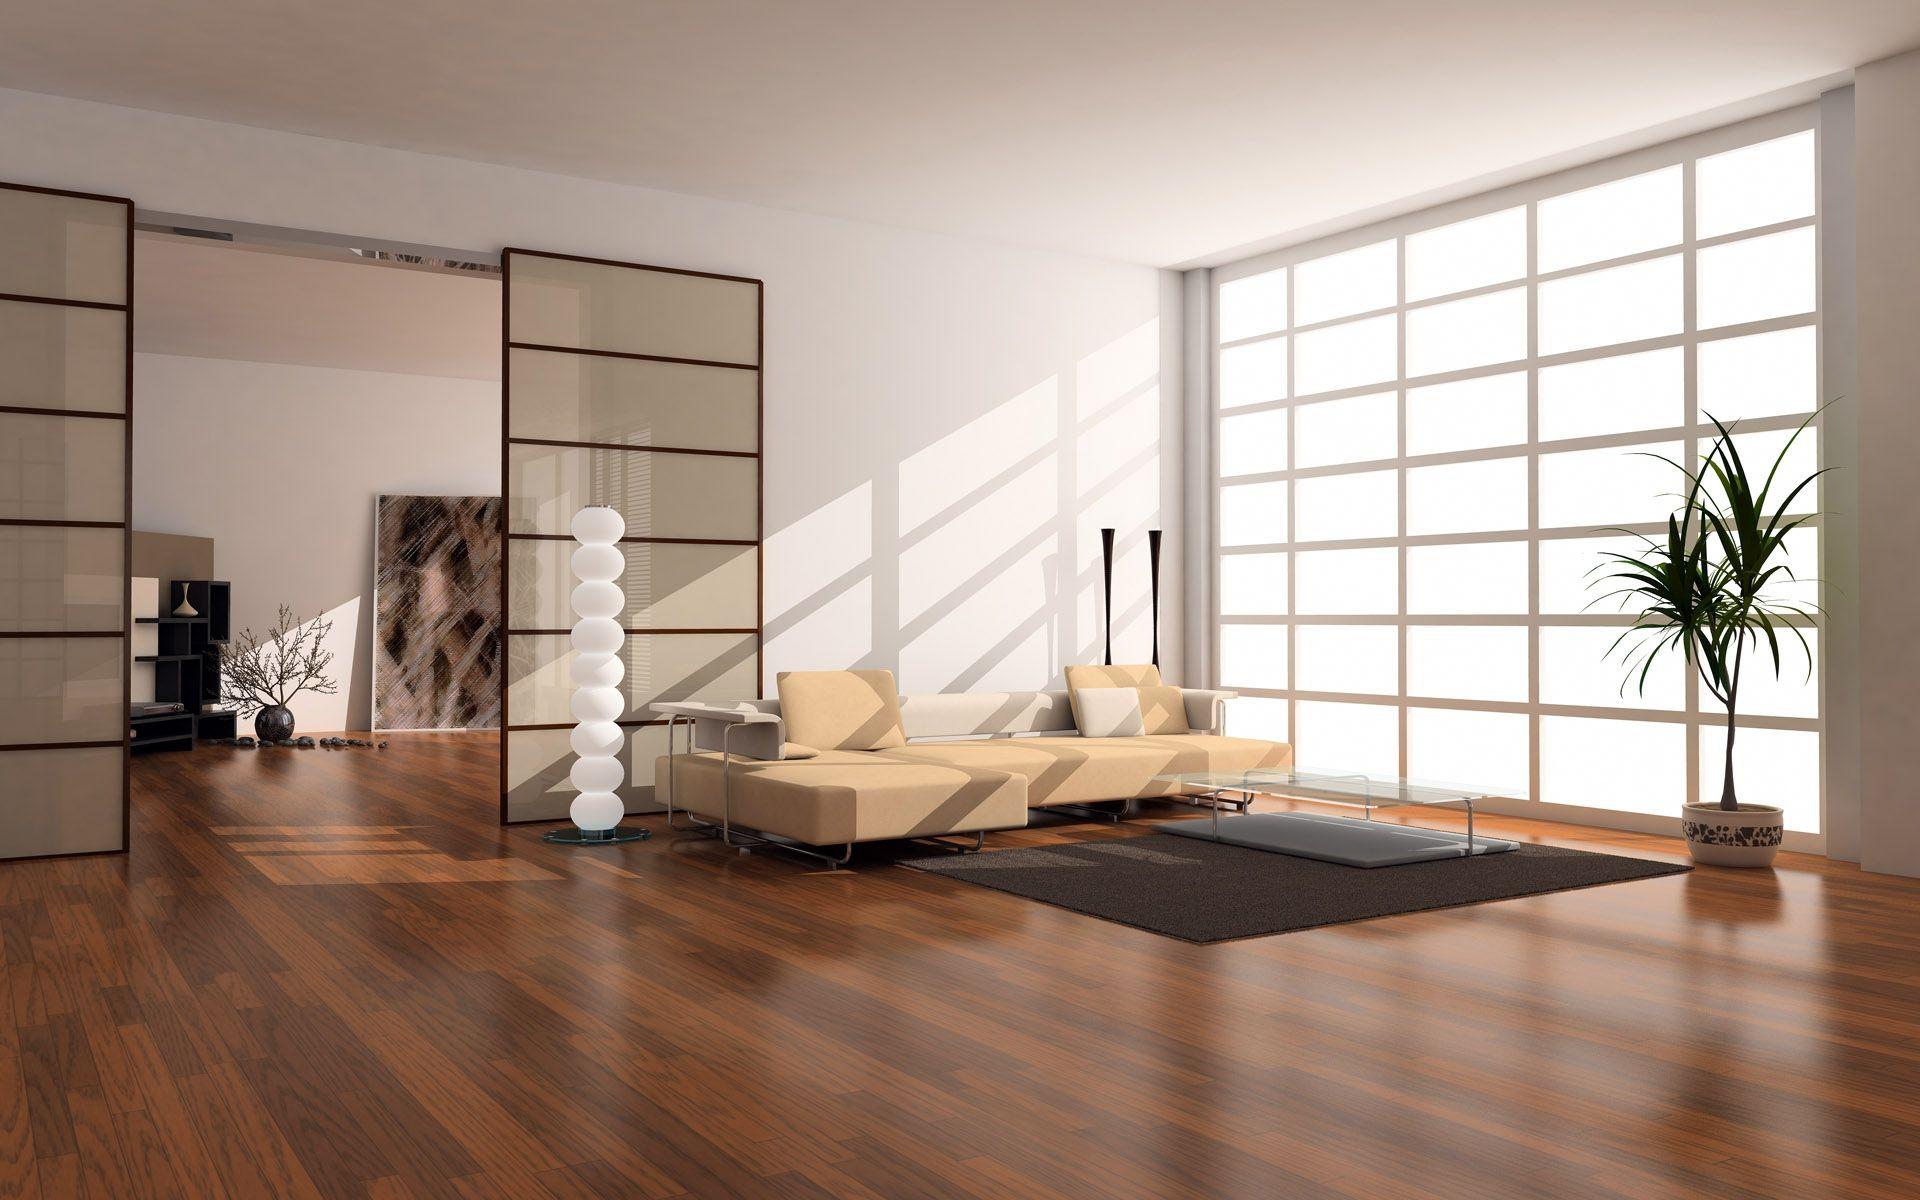 Beau Japan Style Apartment Beige Couch Shiny Wood Floors Create Warm Excerpt  Japanese Bedroom. Apartment Design. Design District Apartments. Studio  Apartment ...